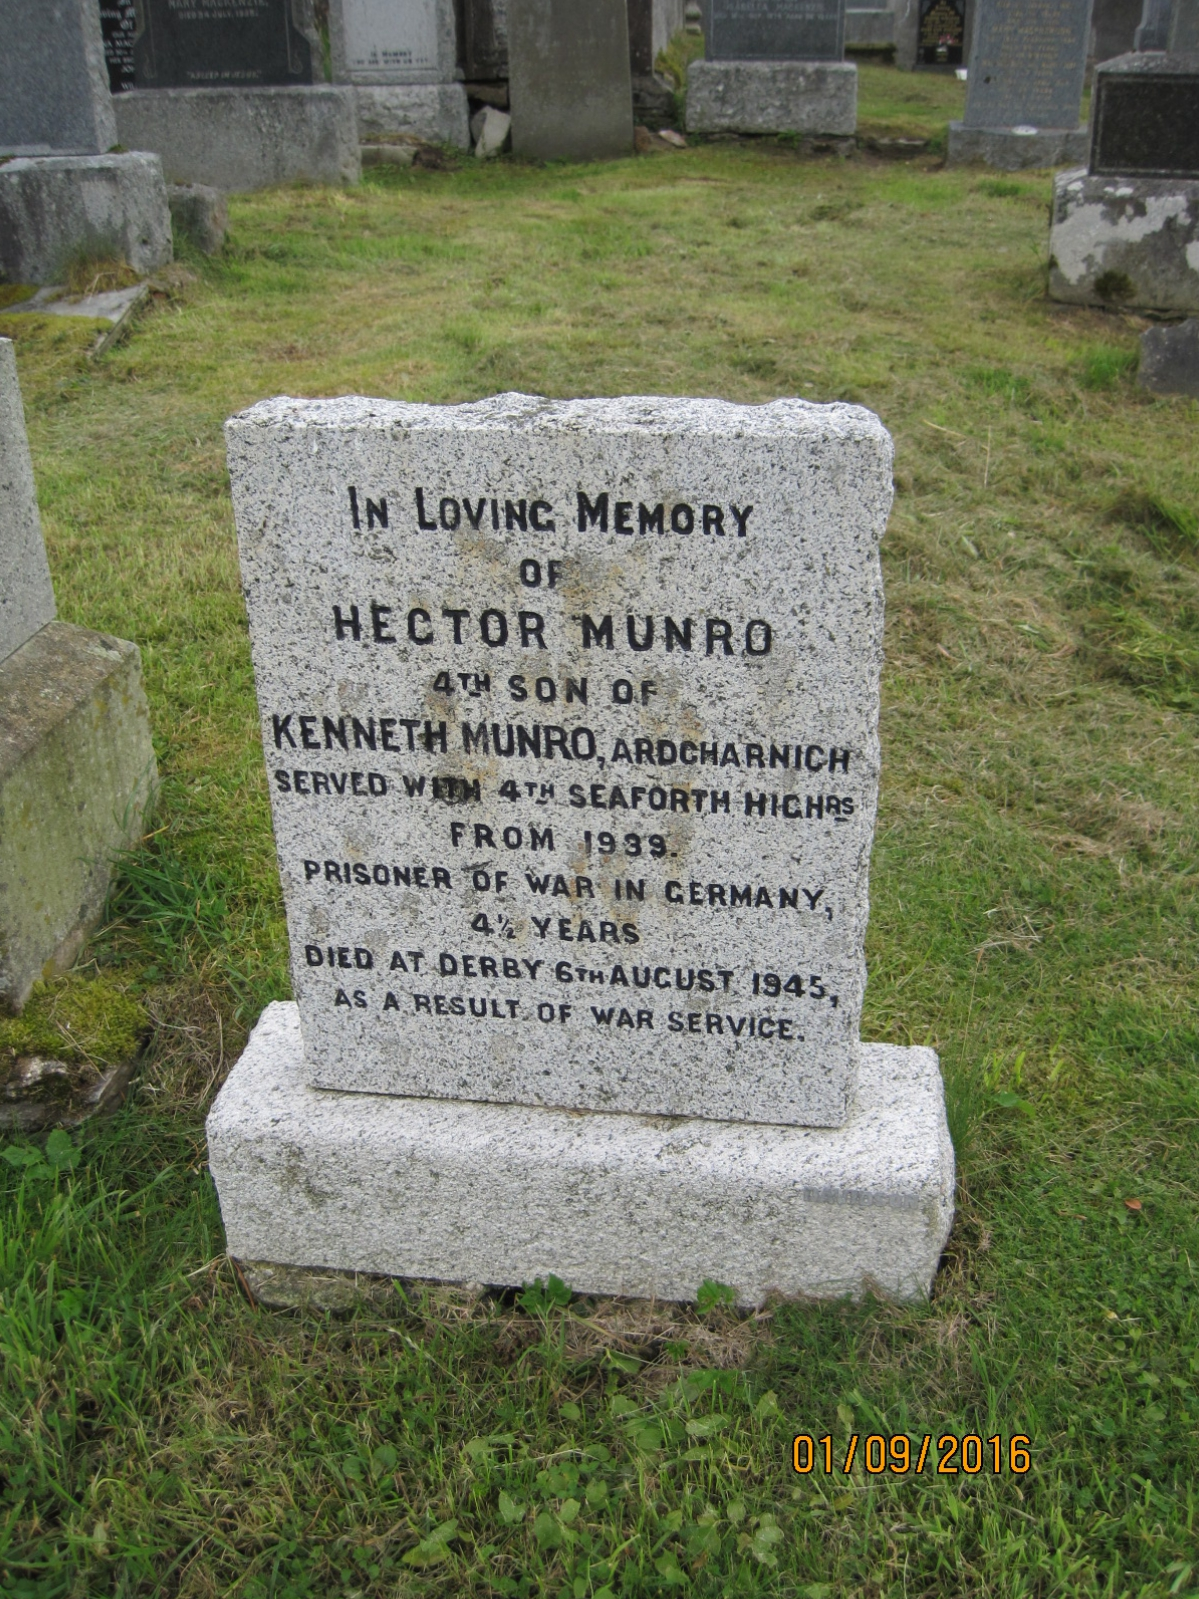 Hector Munro 1945